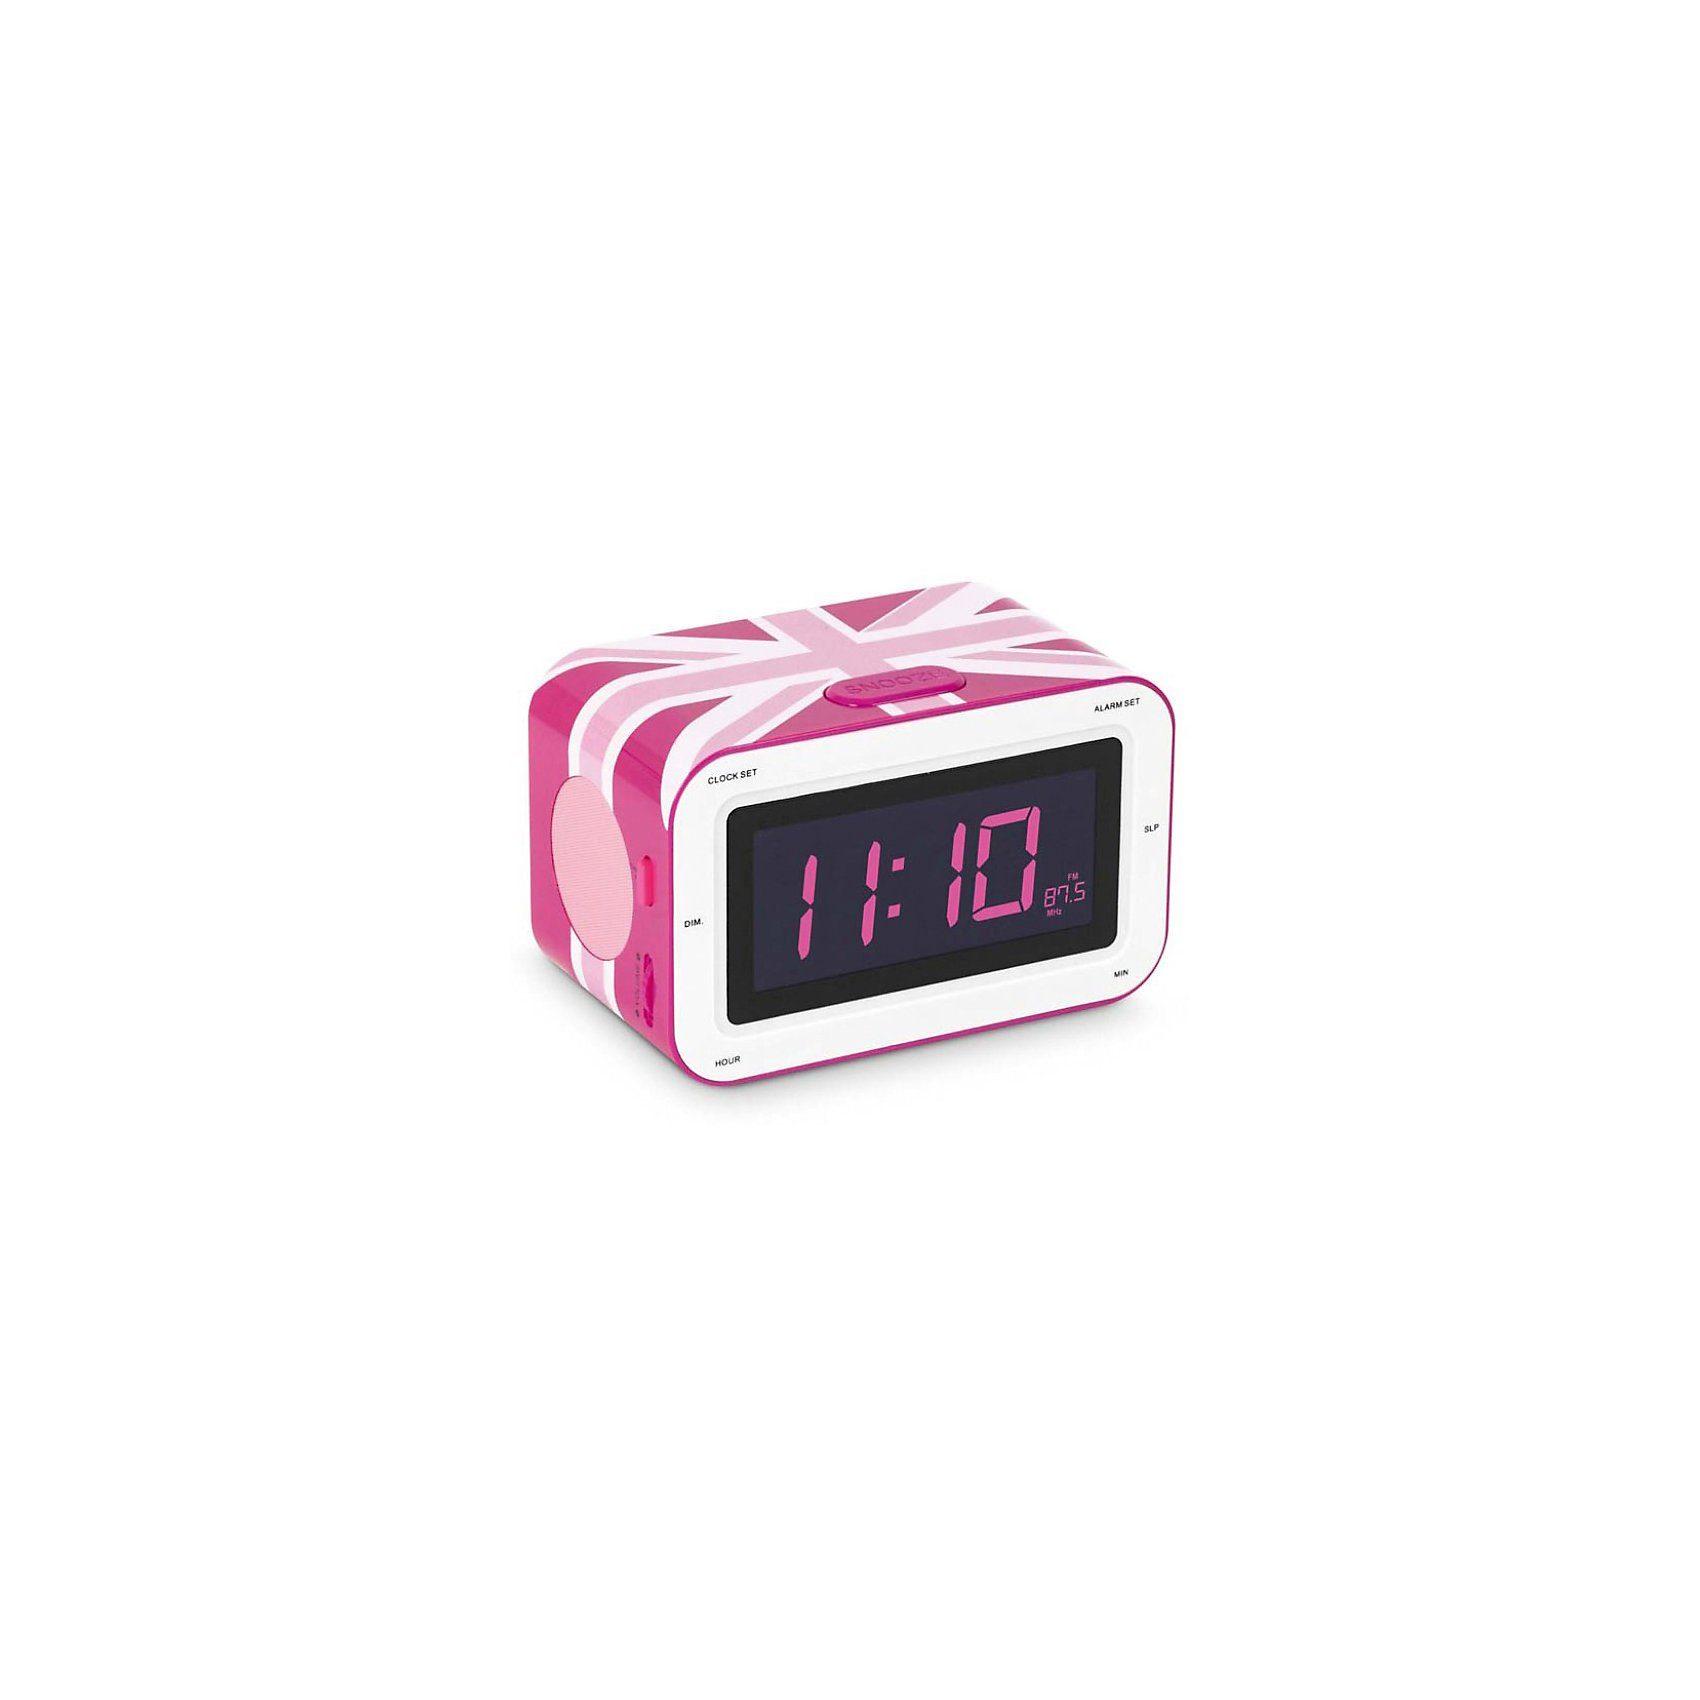 bigben Radiowecker RR30 Union Jack, pink